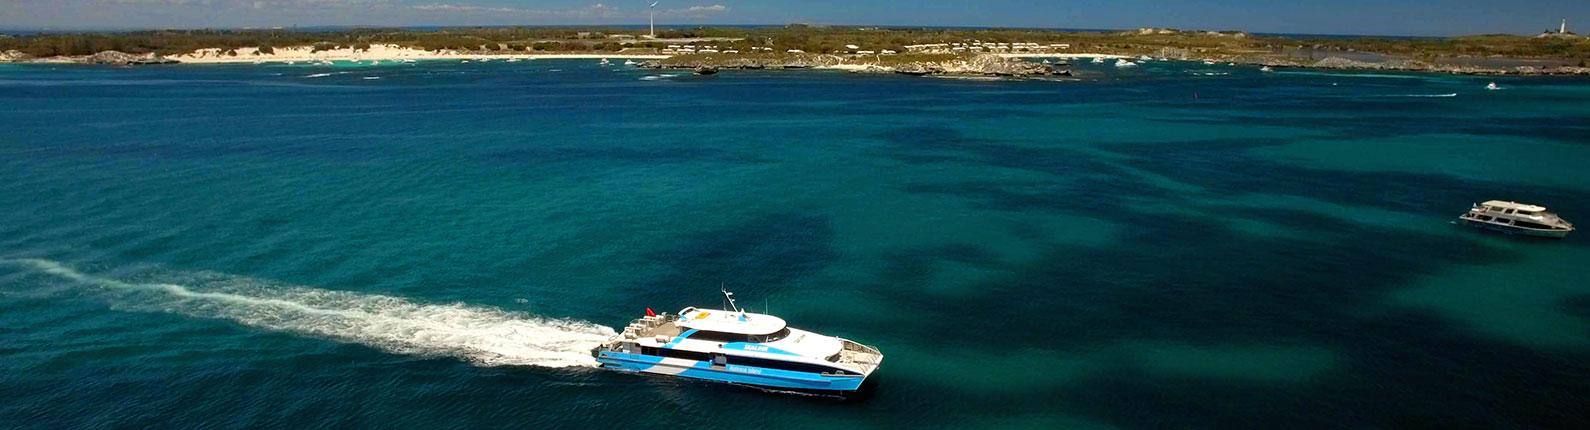 Rotto Ferry